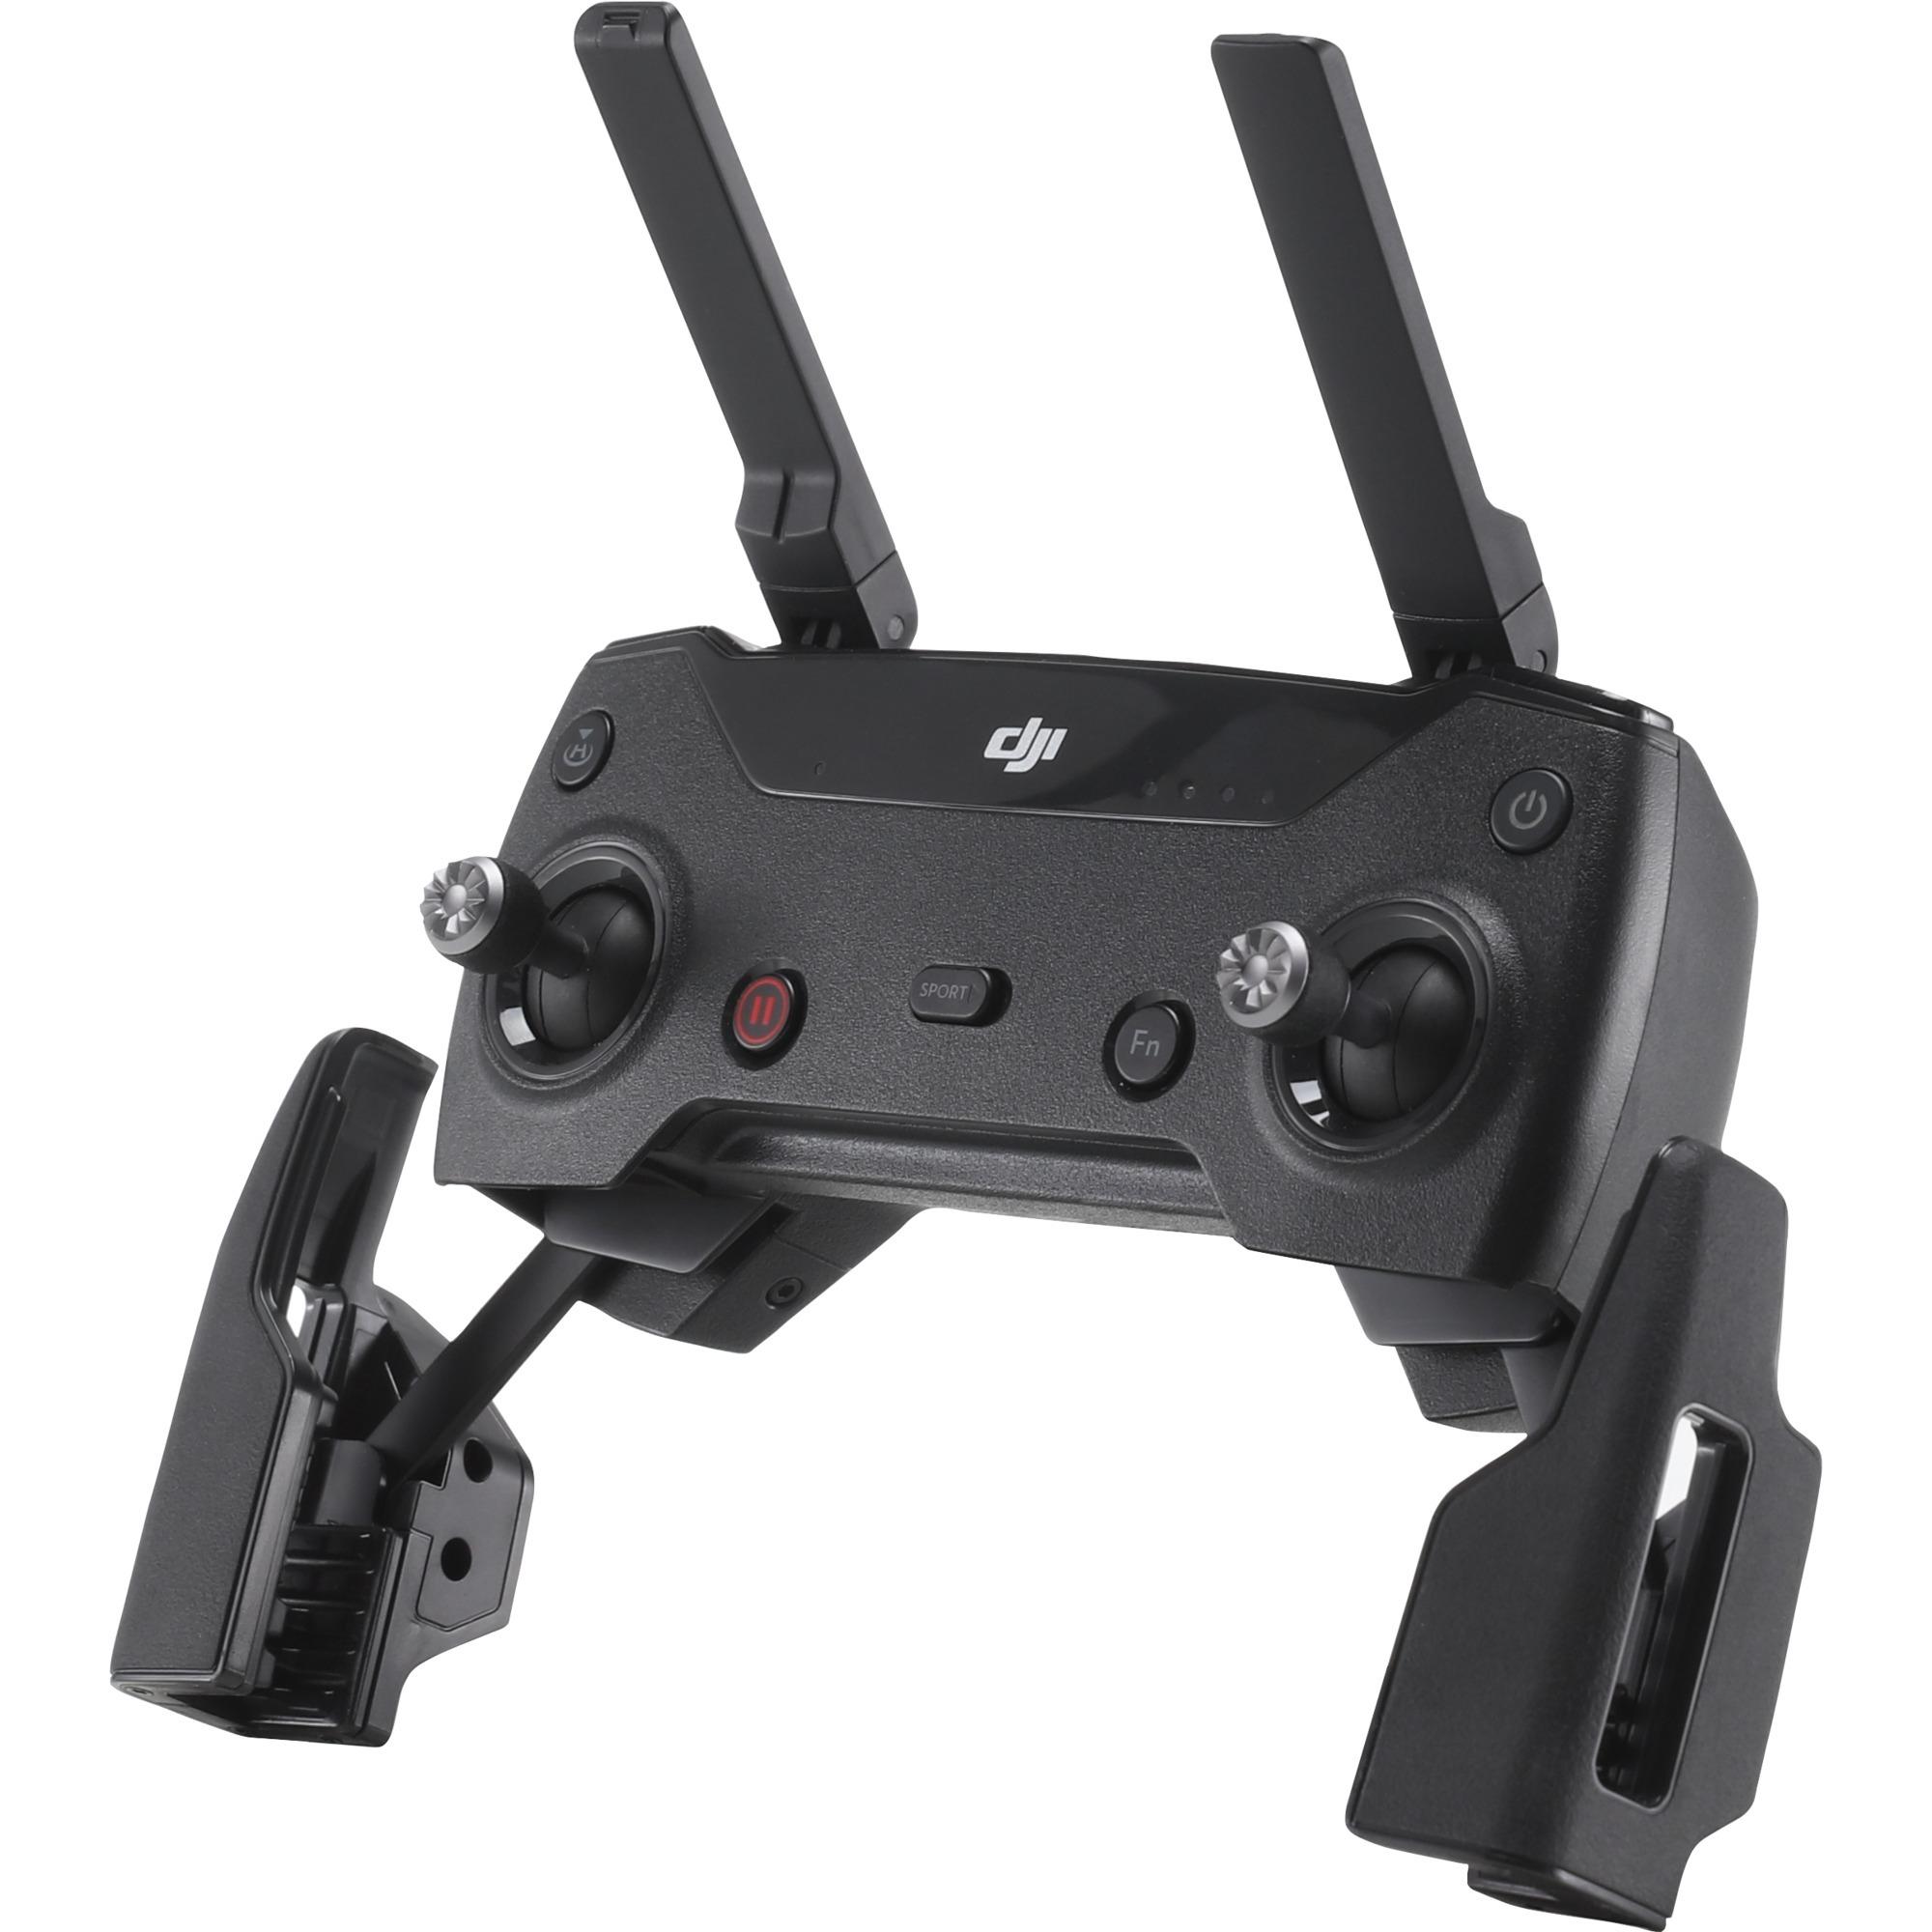 cp000792-kamera-drone-2970mah-sort-radio-kontrolleret-rc-model-fjernbetjening-controller